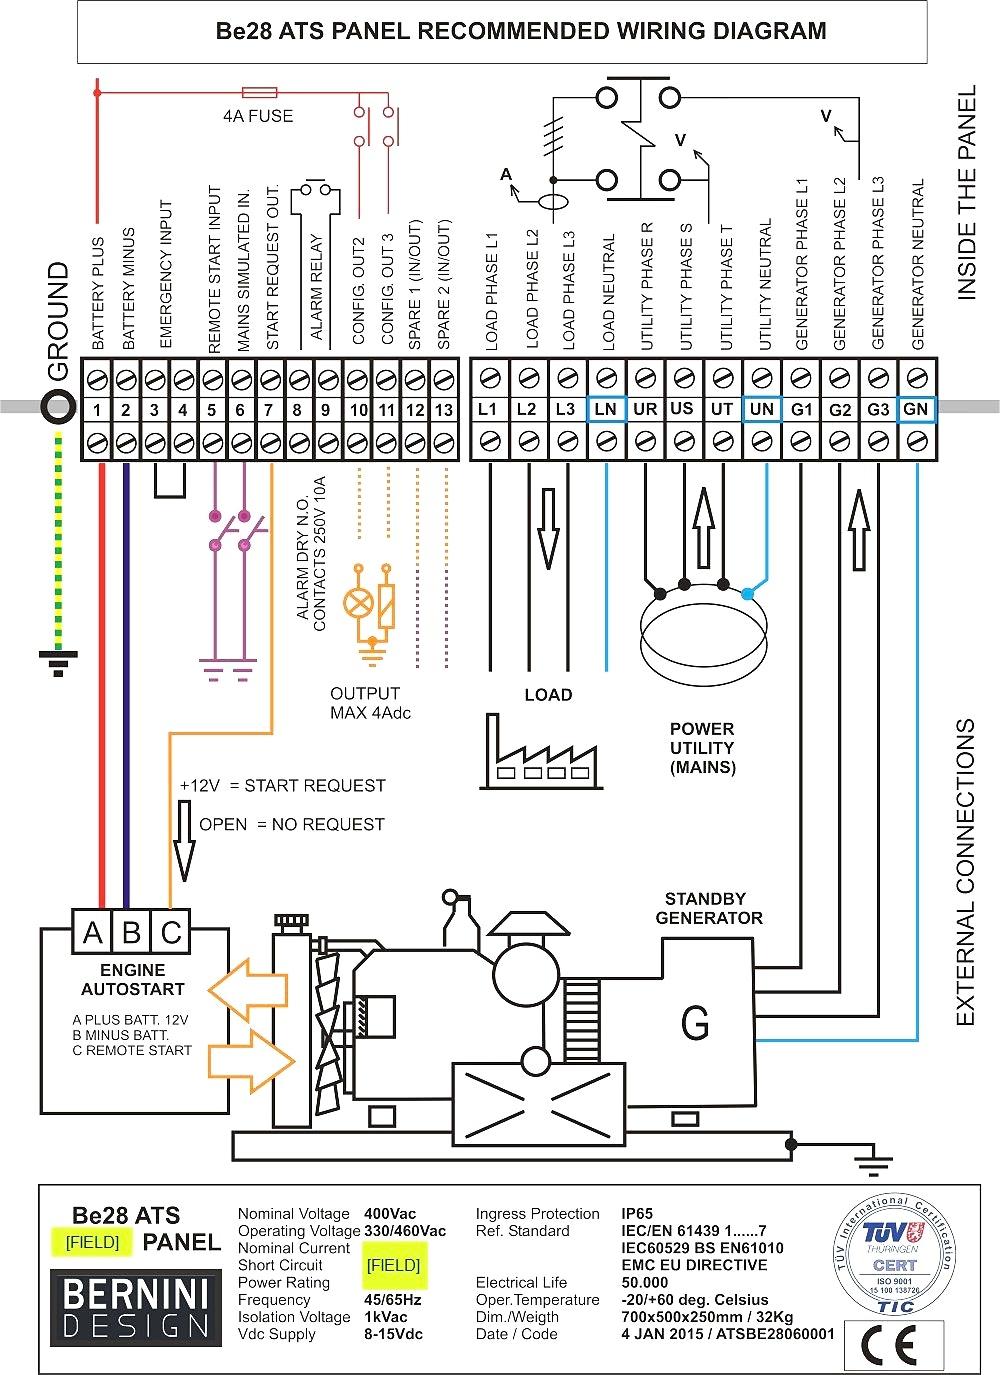 50 amp rv generator onan wiring diagram wiring diagramonan generator transfer switch wiring diagram wiring schematic diagram